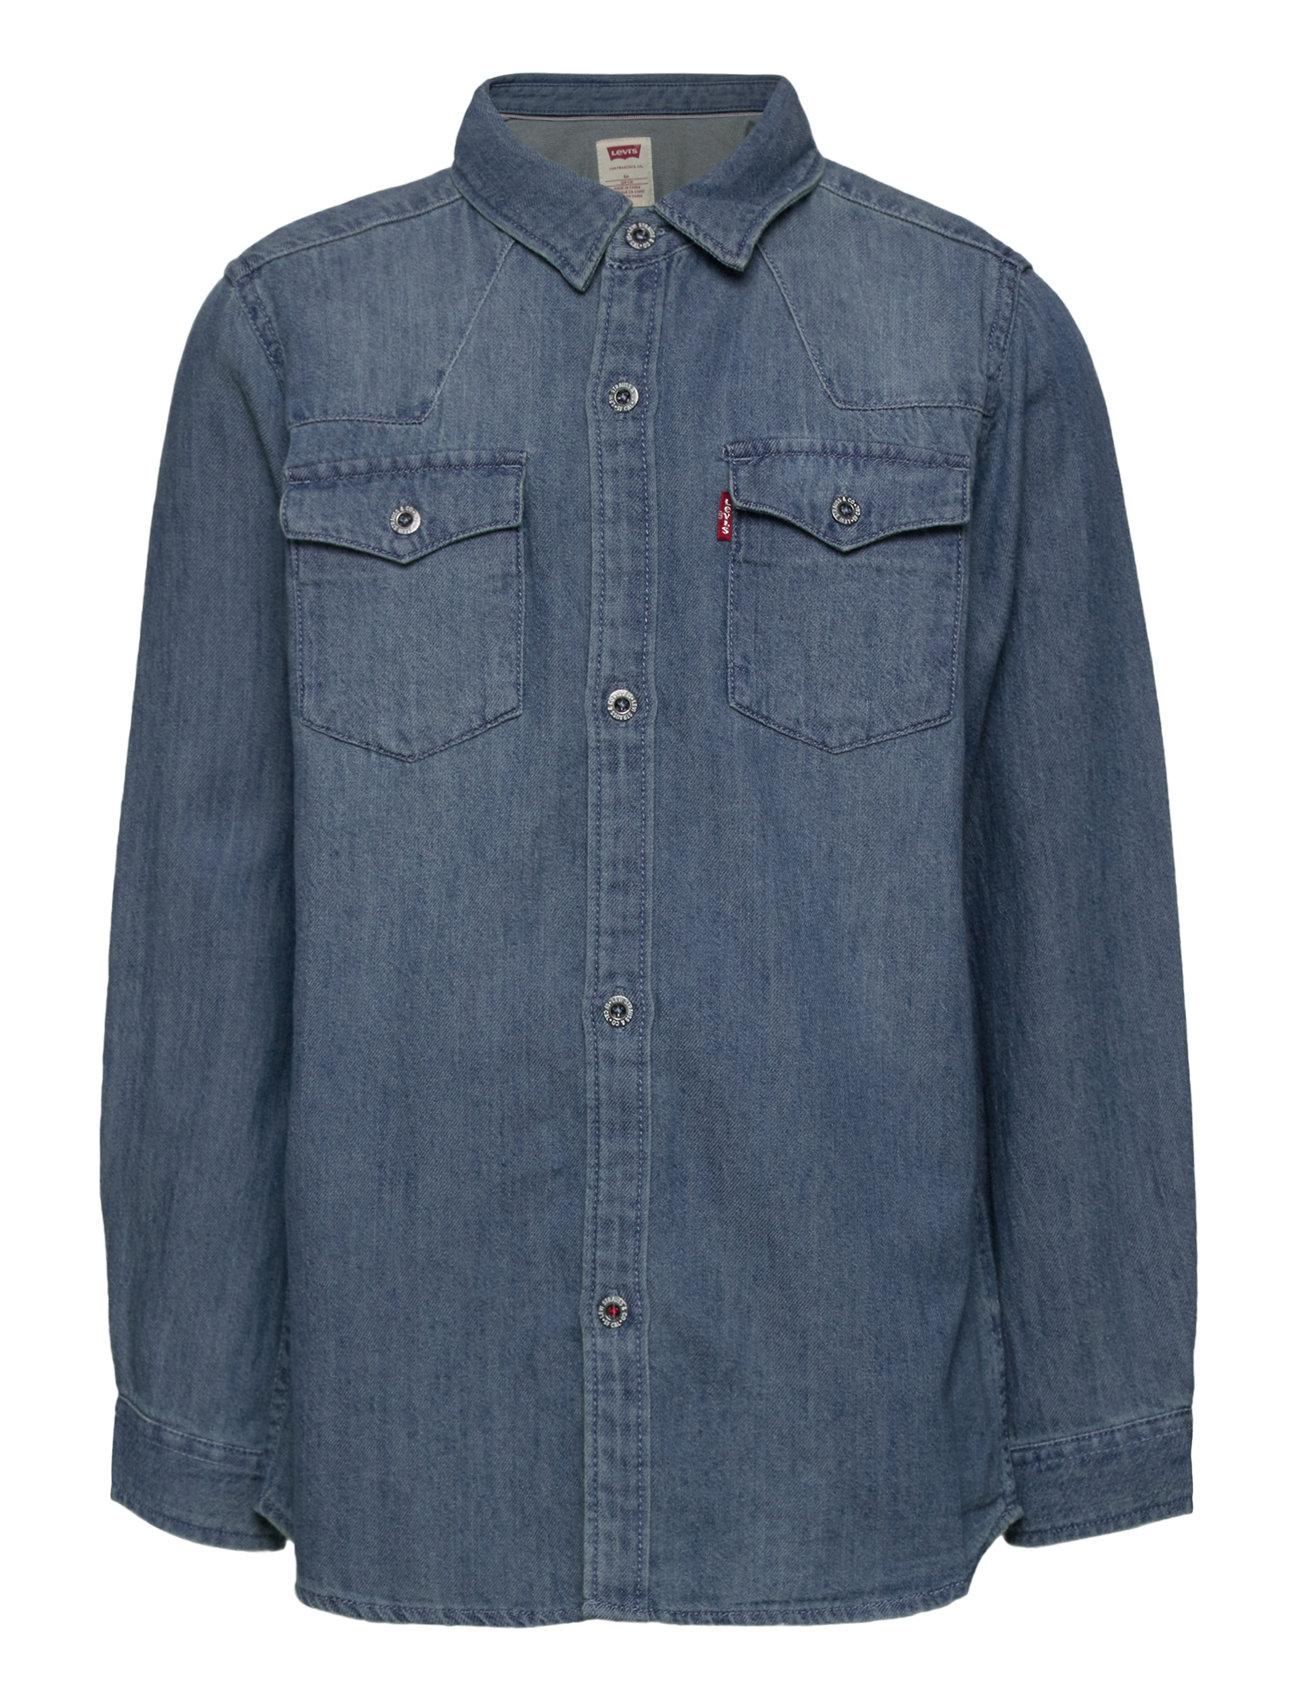 Levi's - LVB-BARSTOW WESTERN SHIRT - shirts - vintage stone - 0